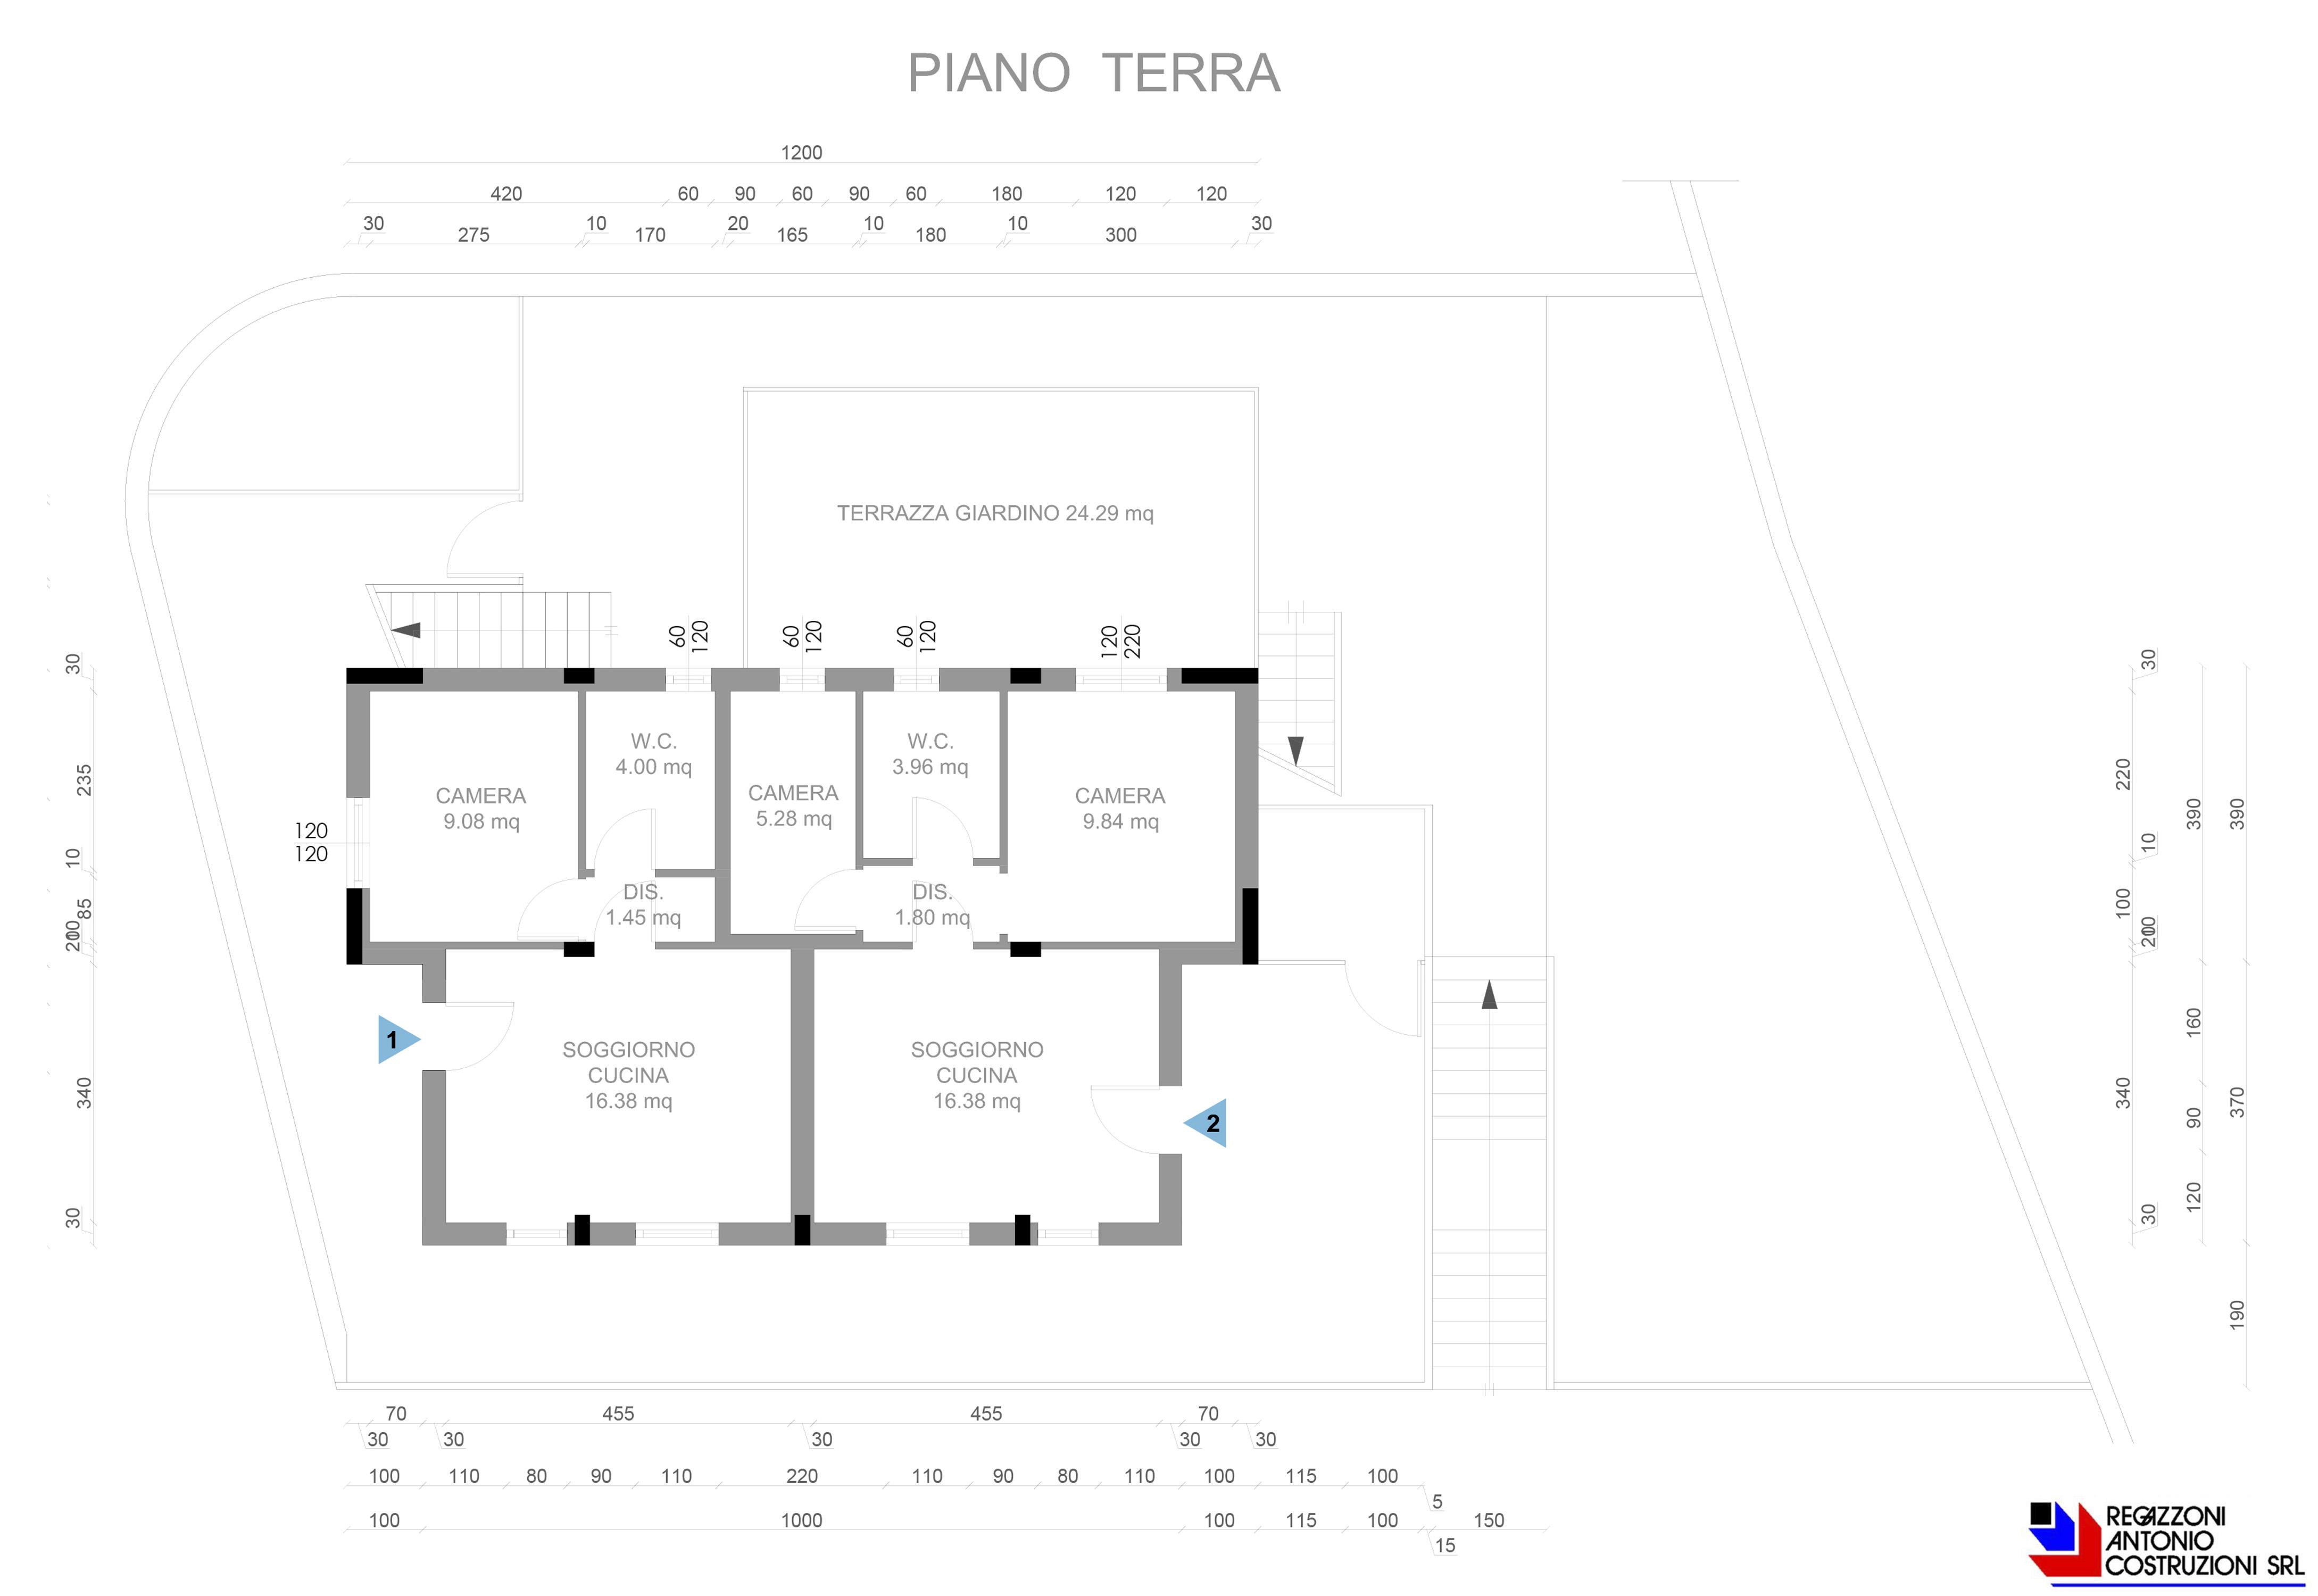 Piano piano terra Monticello 3 - scala 1a100